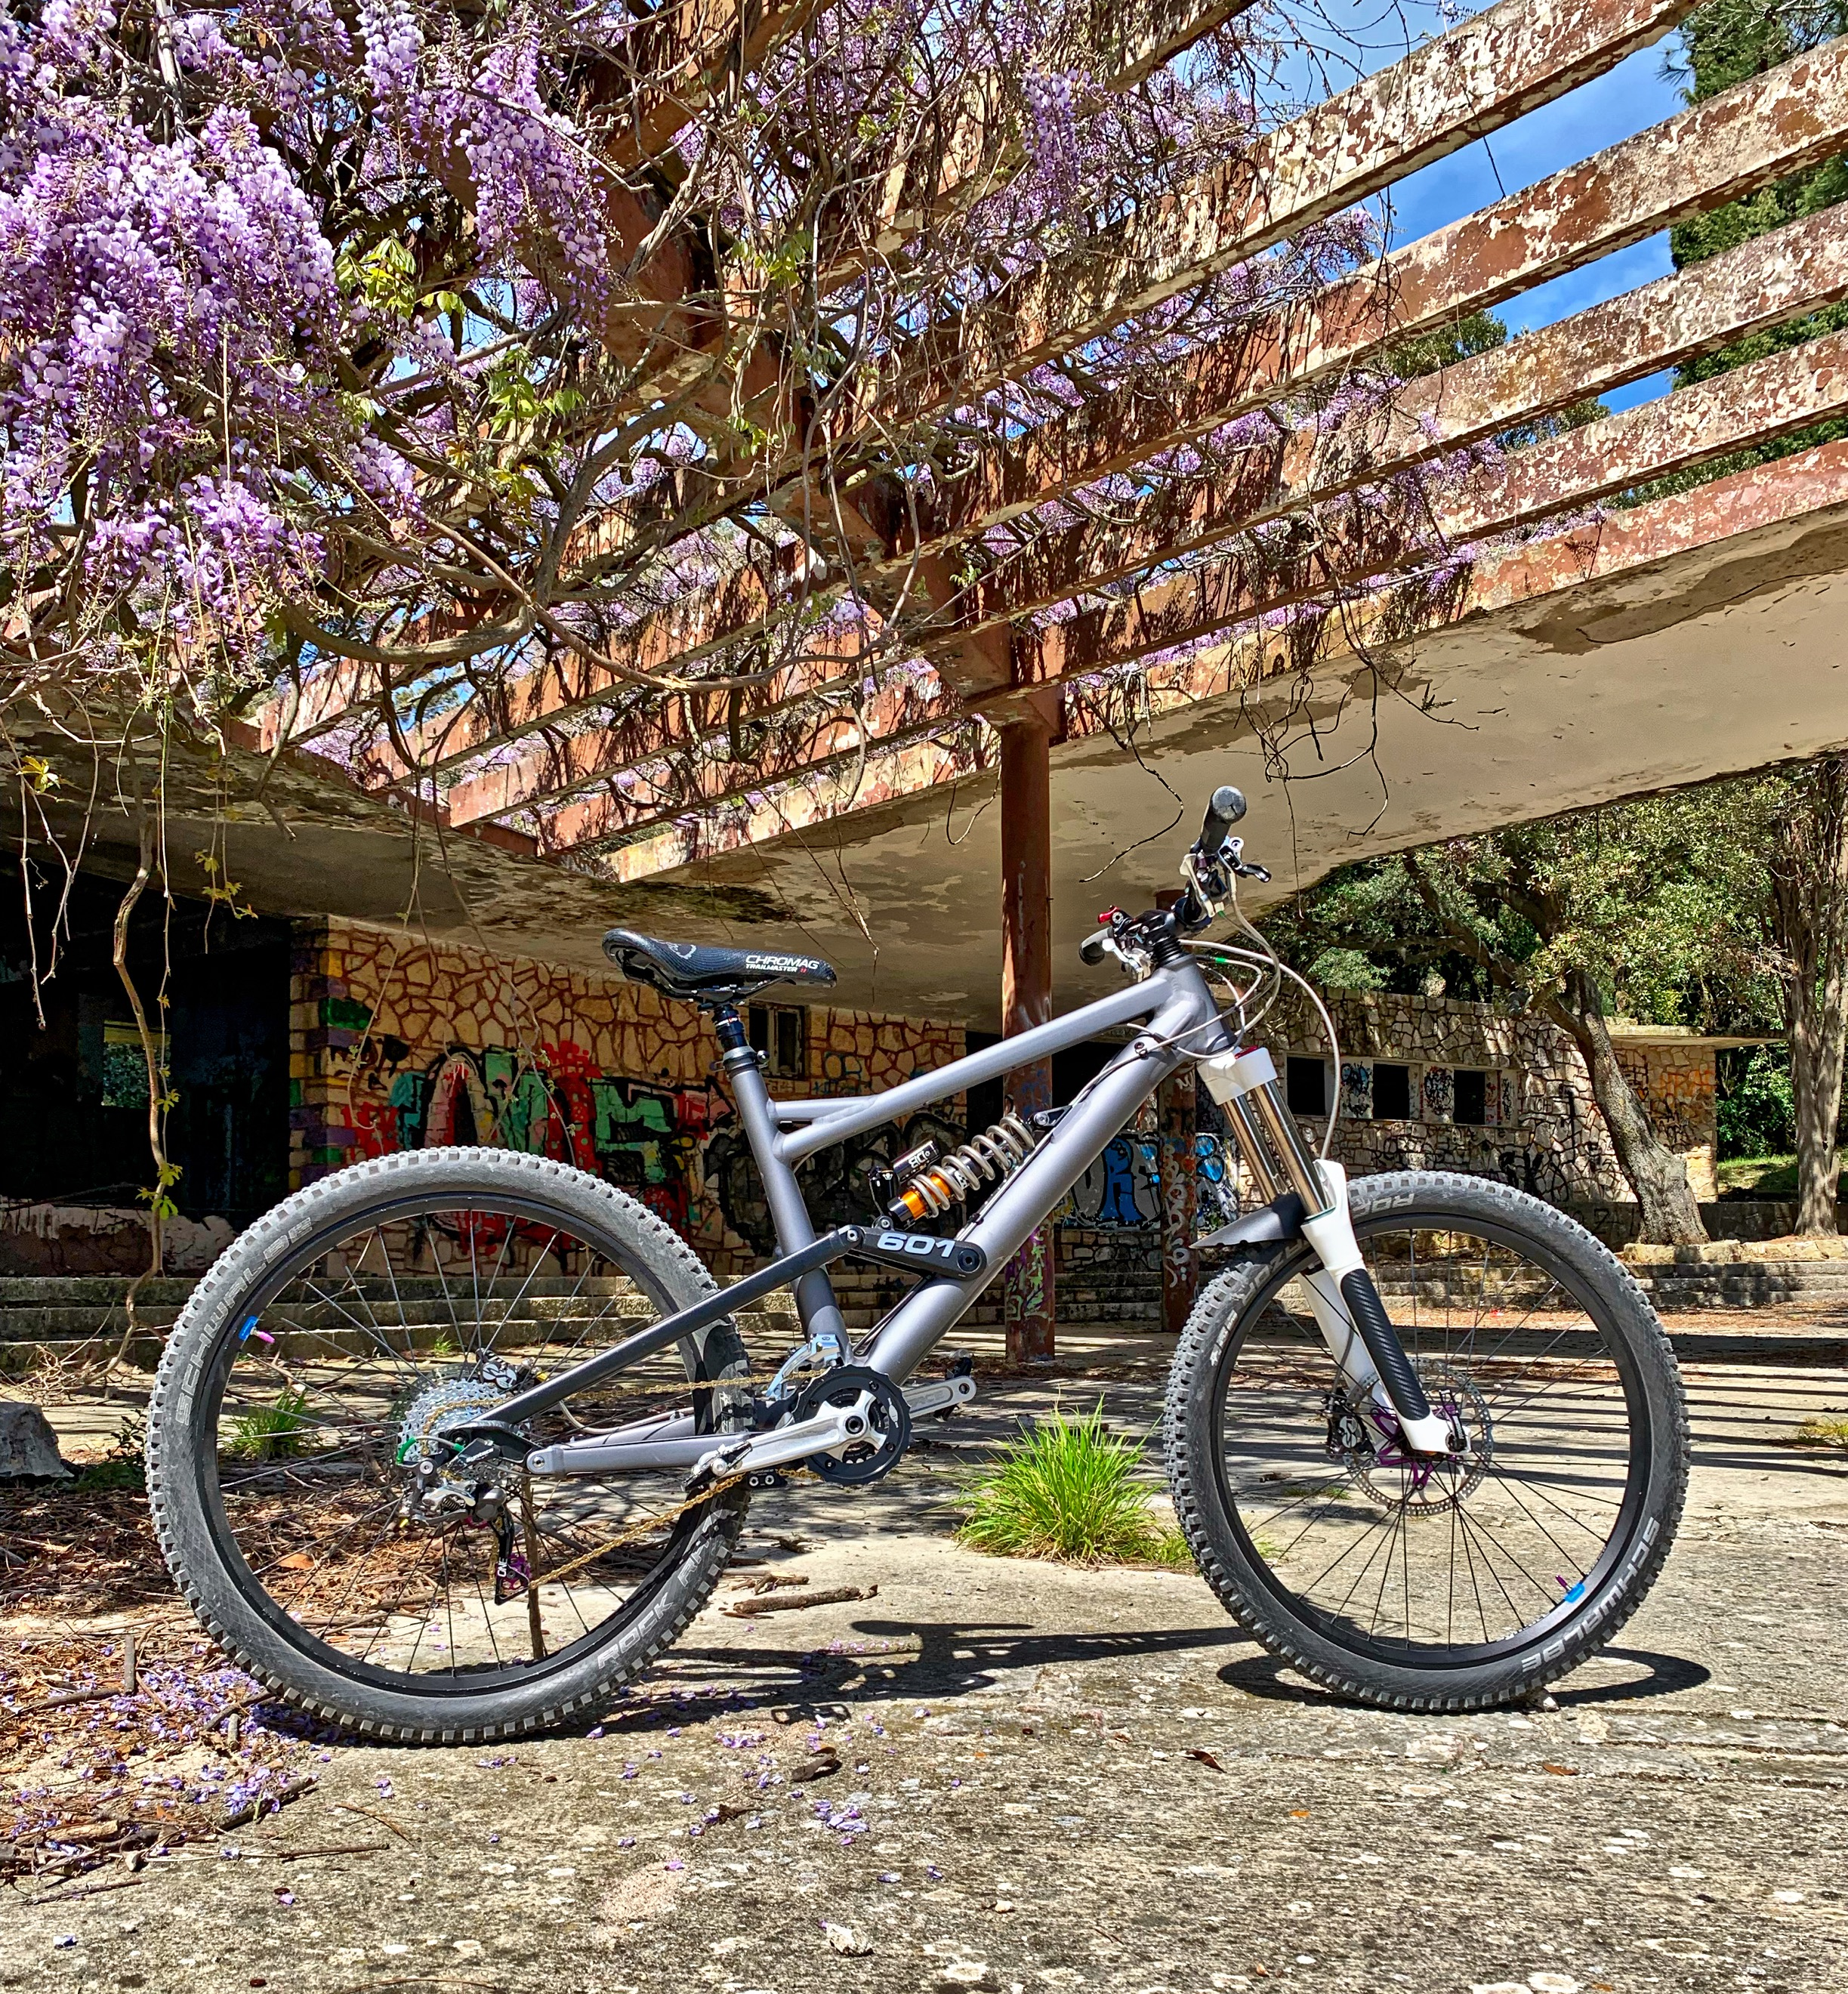 [Obrazek: Rovinj-Bike-04-2019-1.jpg]